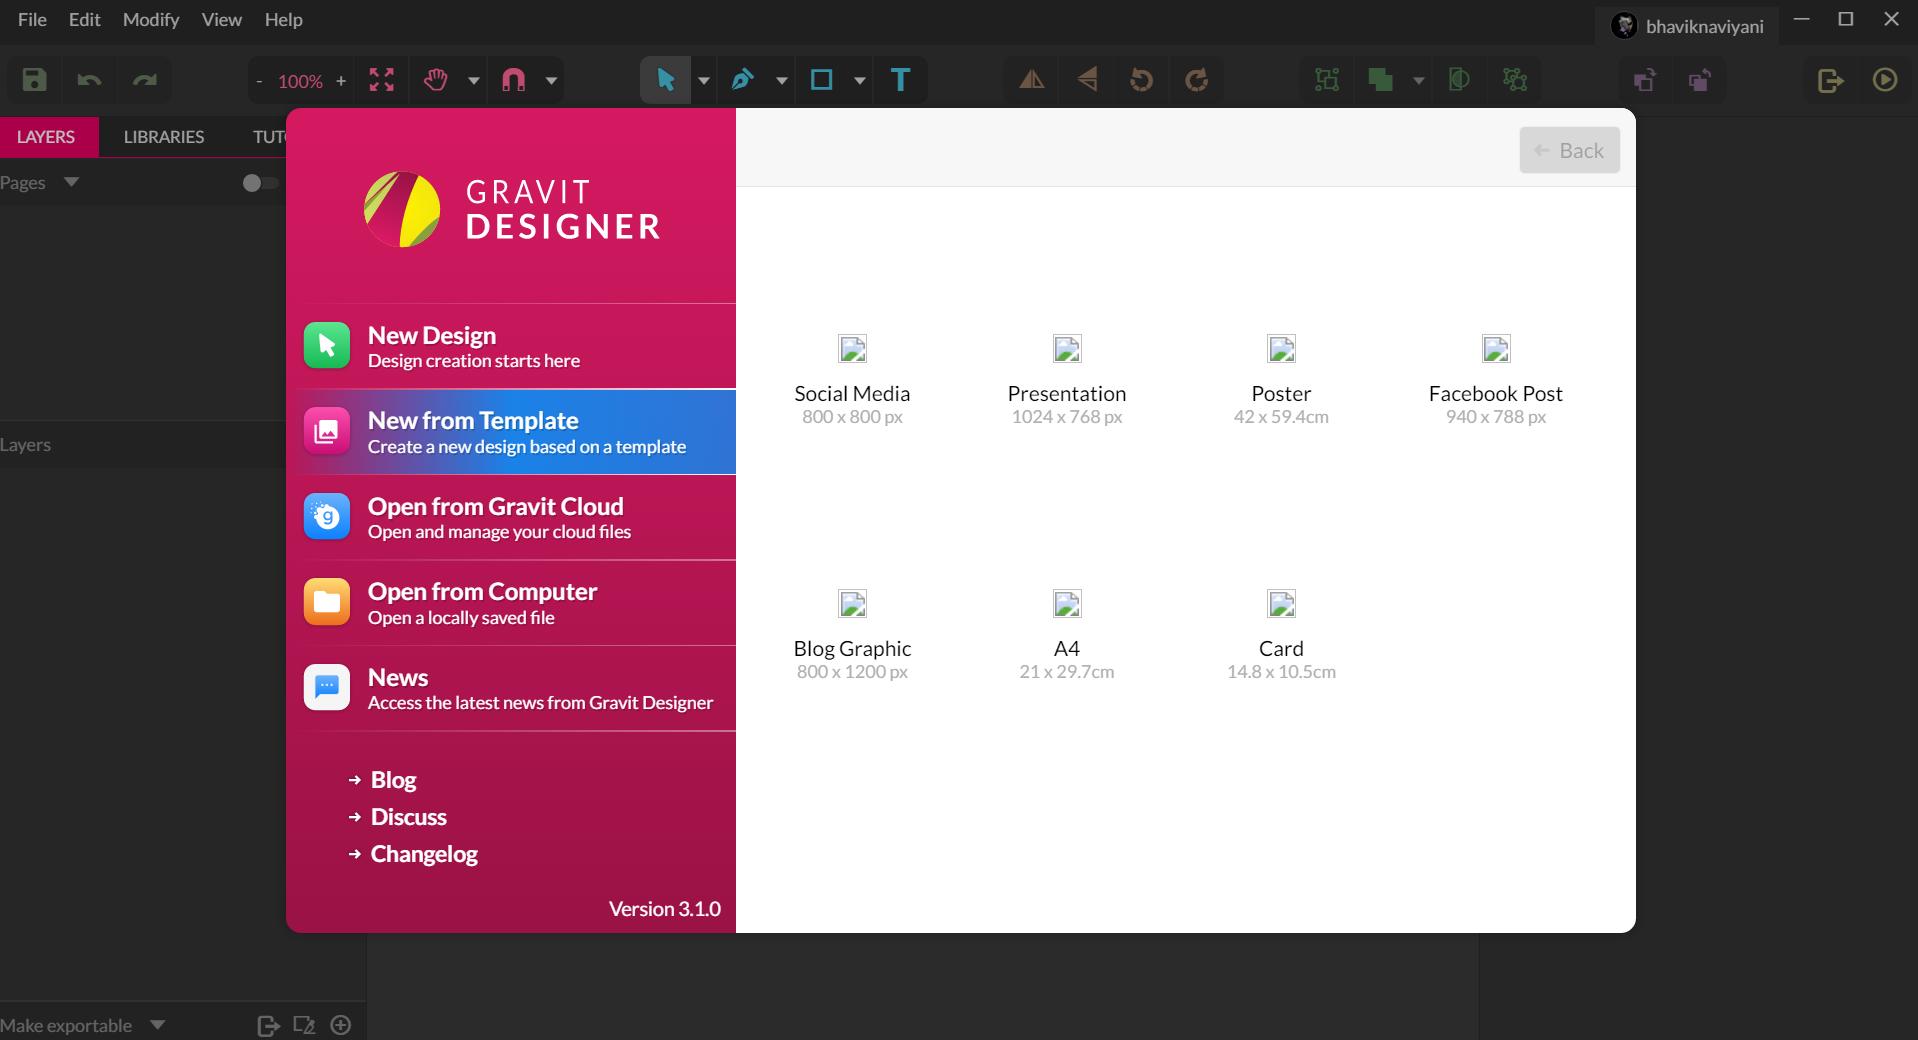 Gravit Designer v. 3.3.1 / Gravit online - umfangreiches Vektor ...